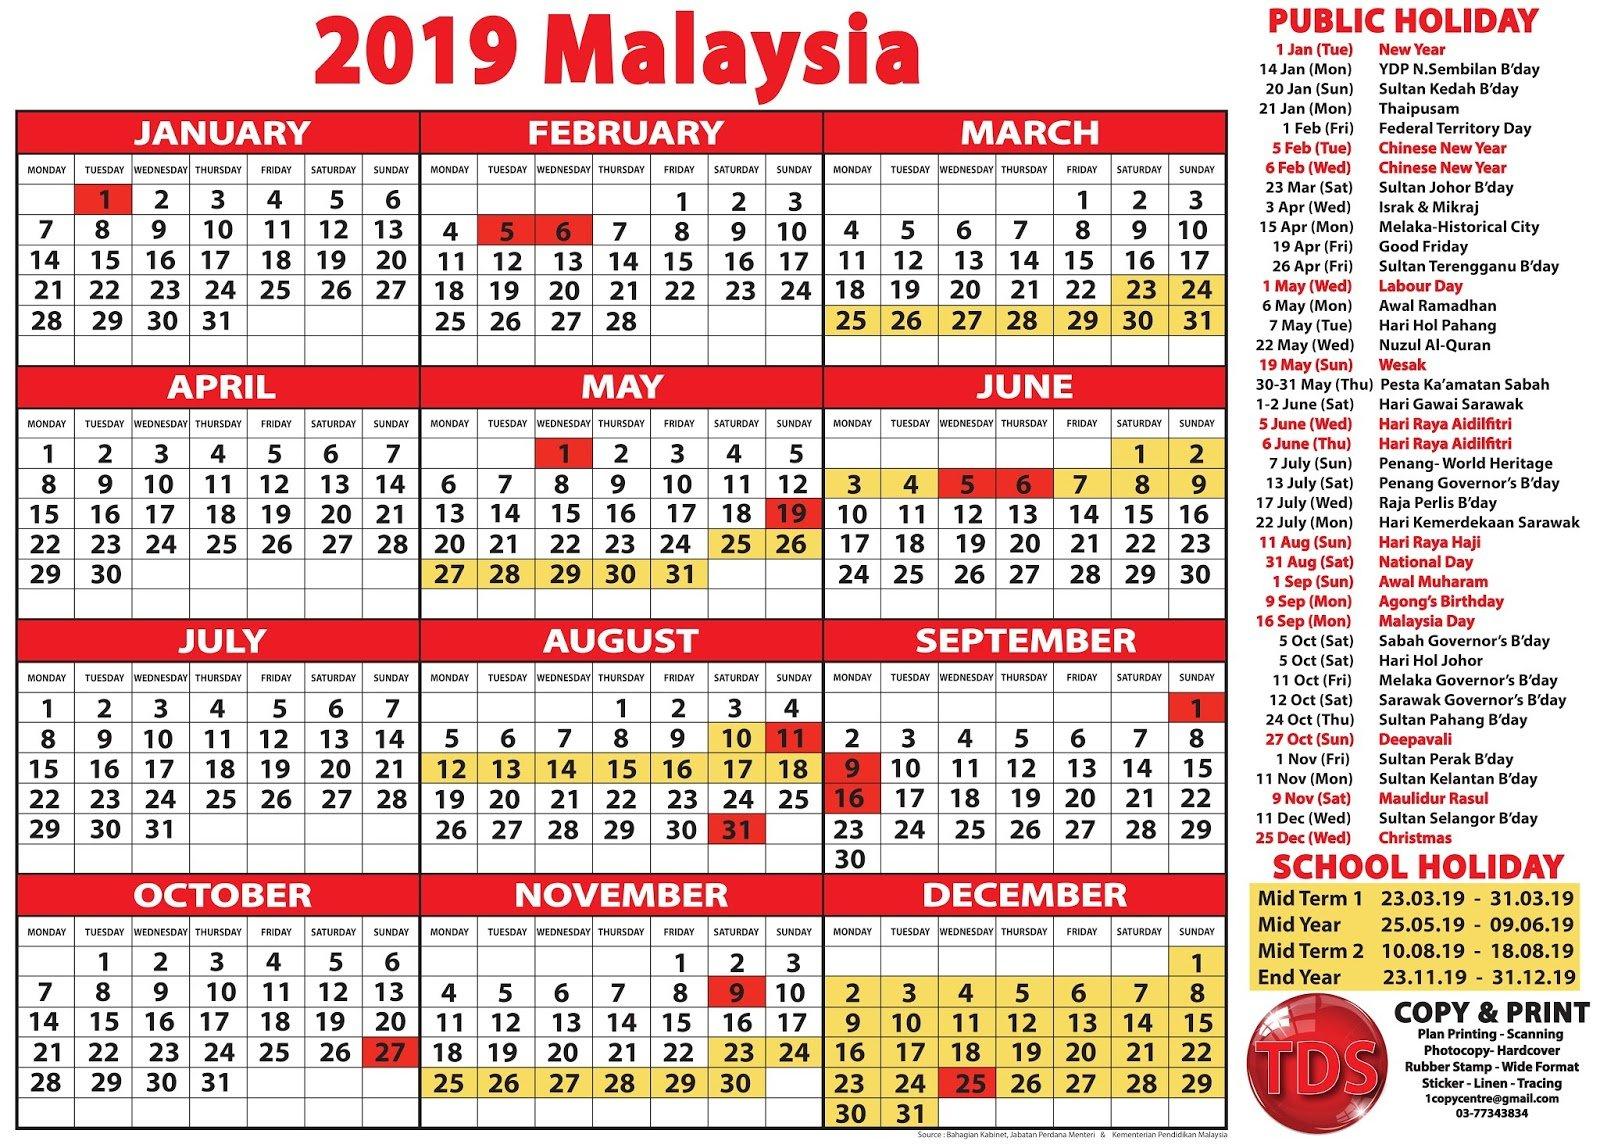 2019 Calendar Malaysia - Kalendar 2019 Malaysia Calendar 2019 Malaysia